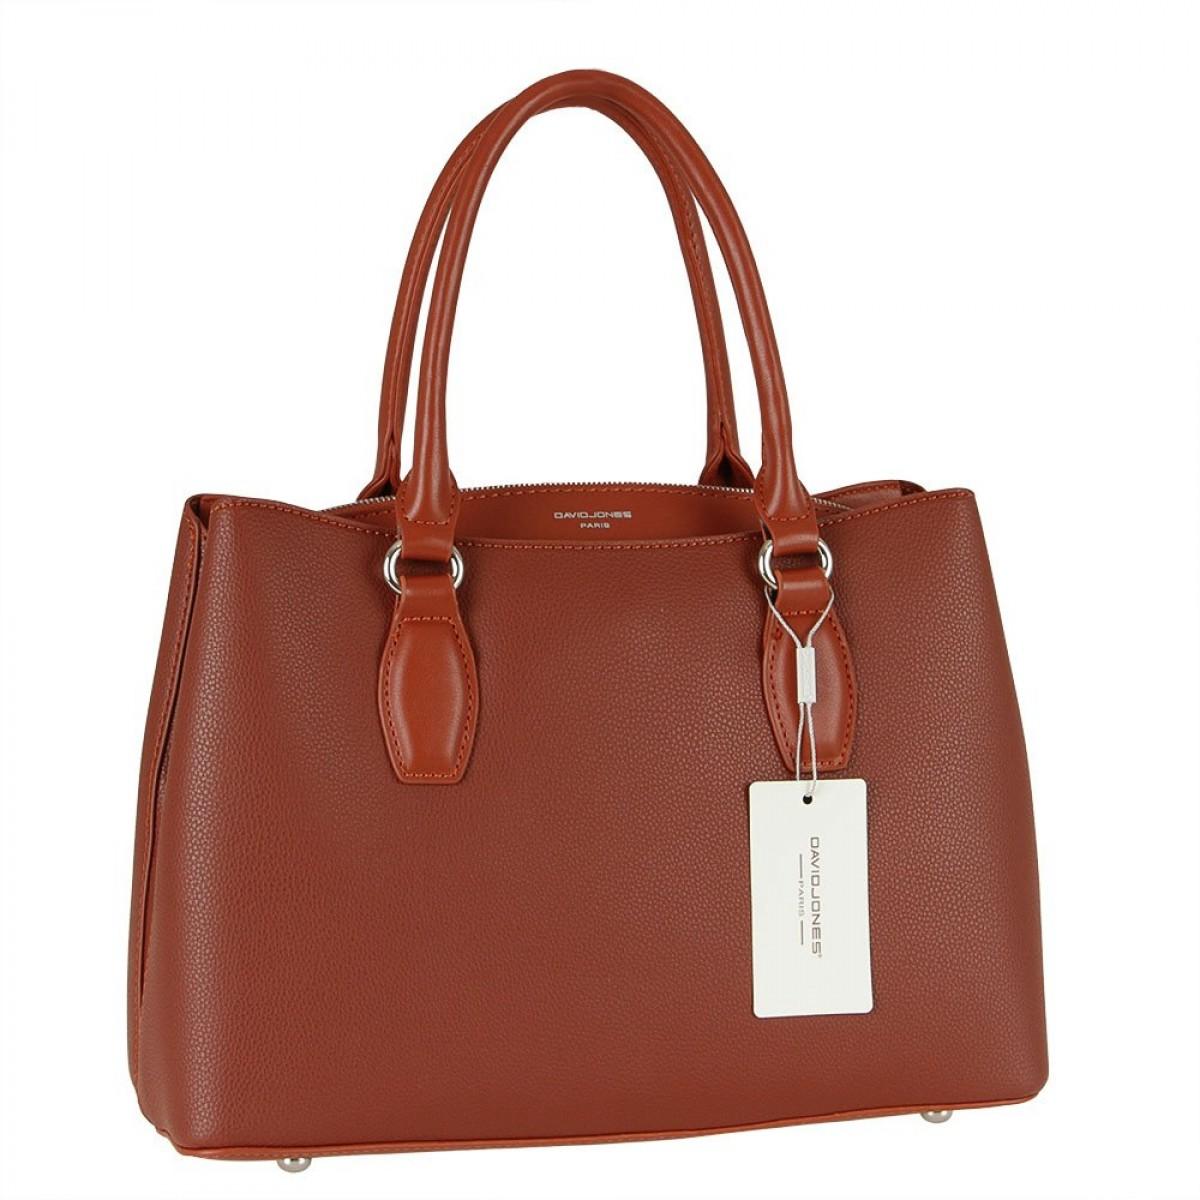 Жіноча сумка David Jones CM5836 SIENNA